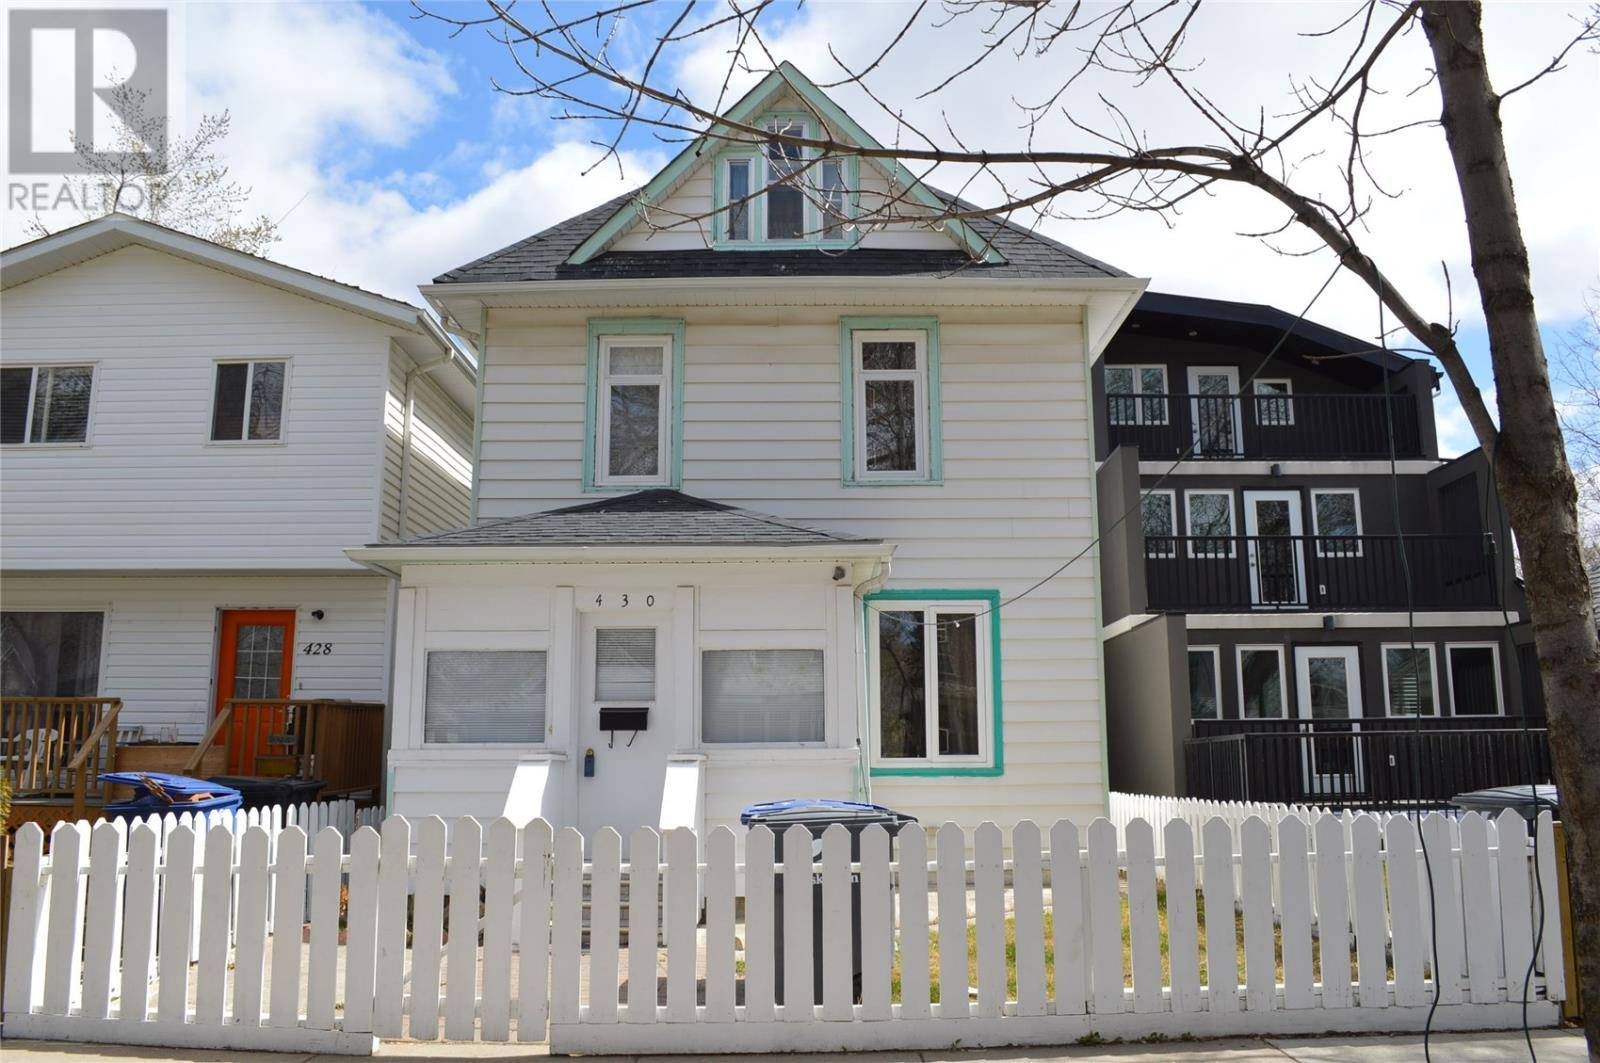 House for sale at 430 G Ave S Saskatoon Saskatchewan - MLS: SK766539